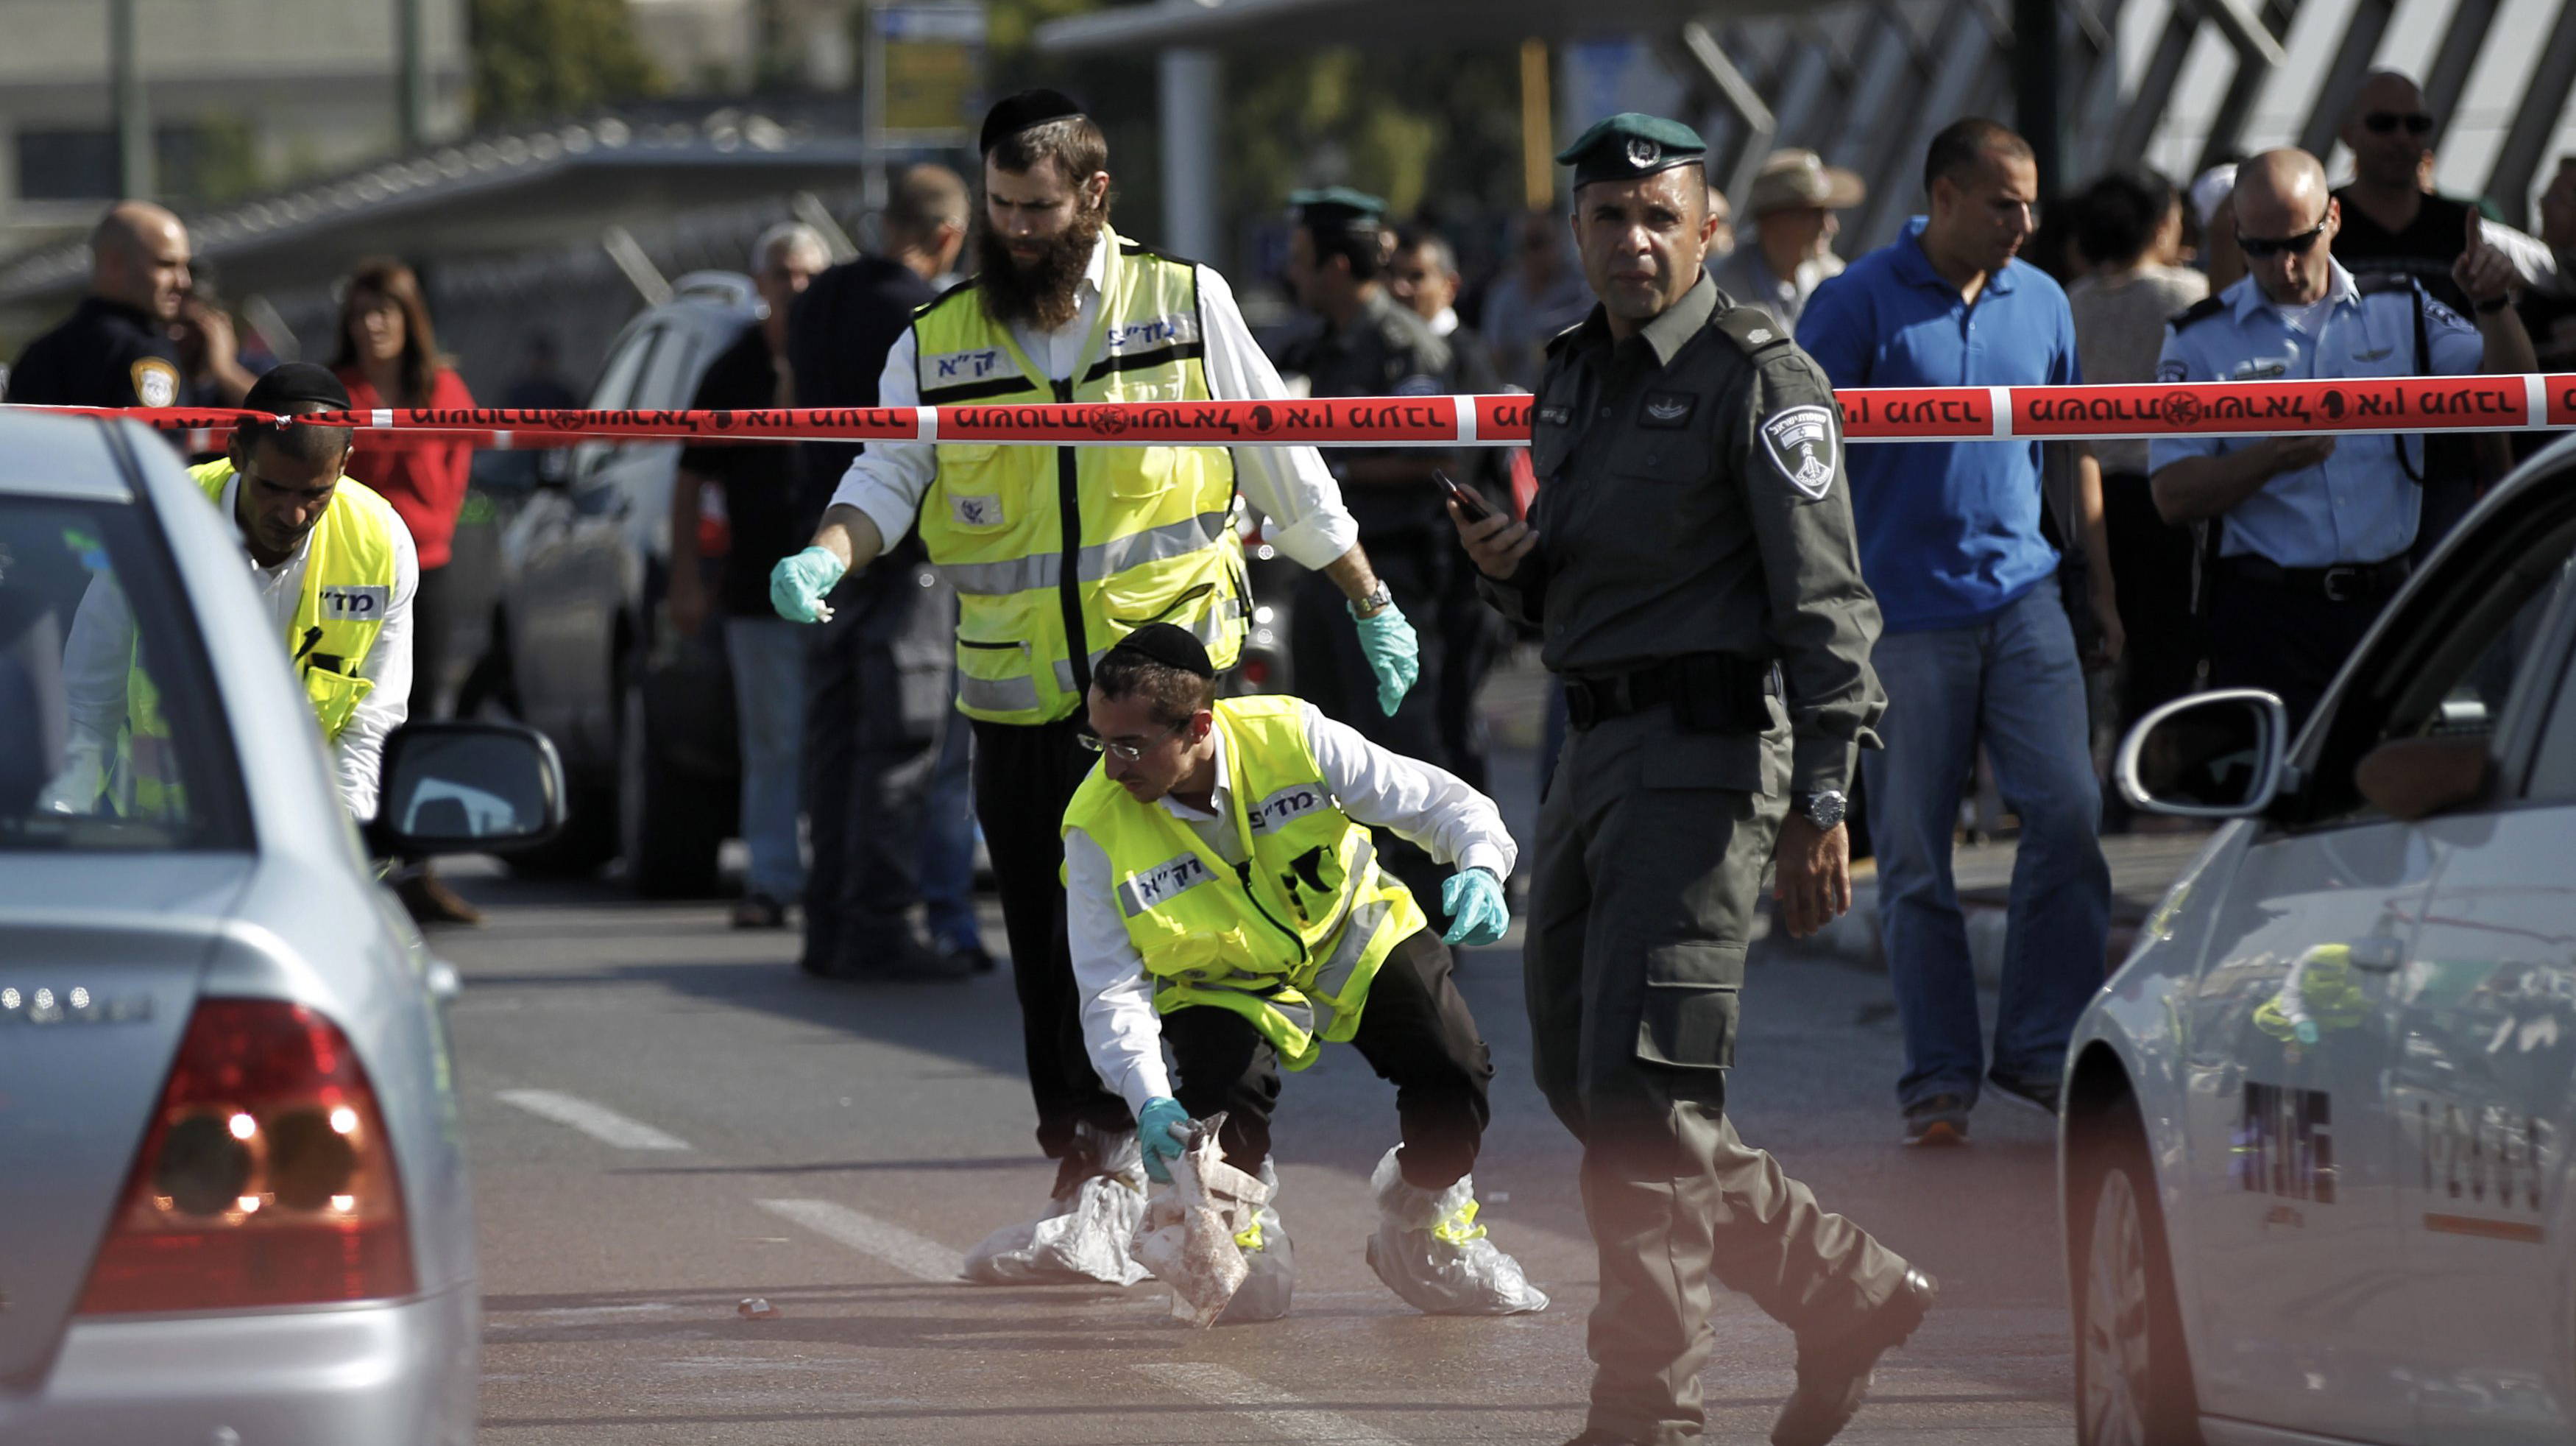 مقتل جنديين إسرائيليين وإصابة آخرين في إطلاق نار شرق رام الله